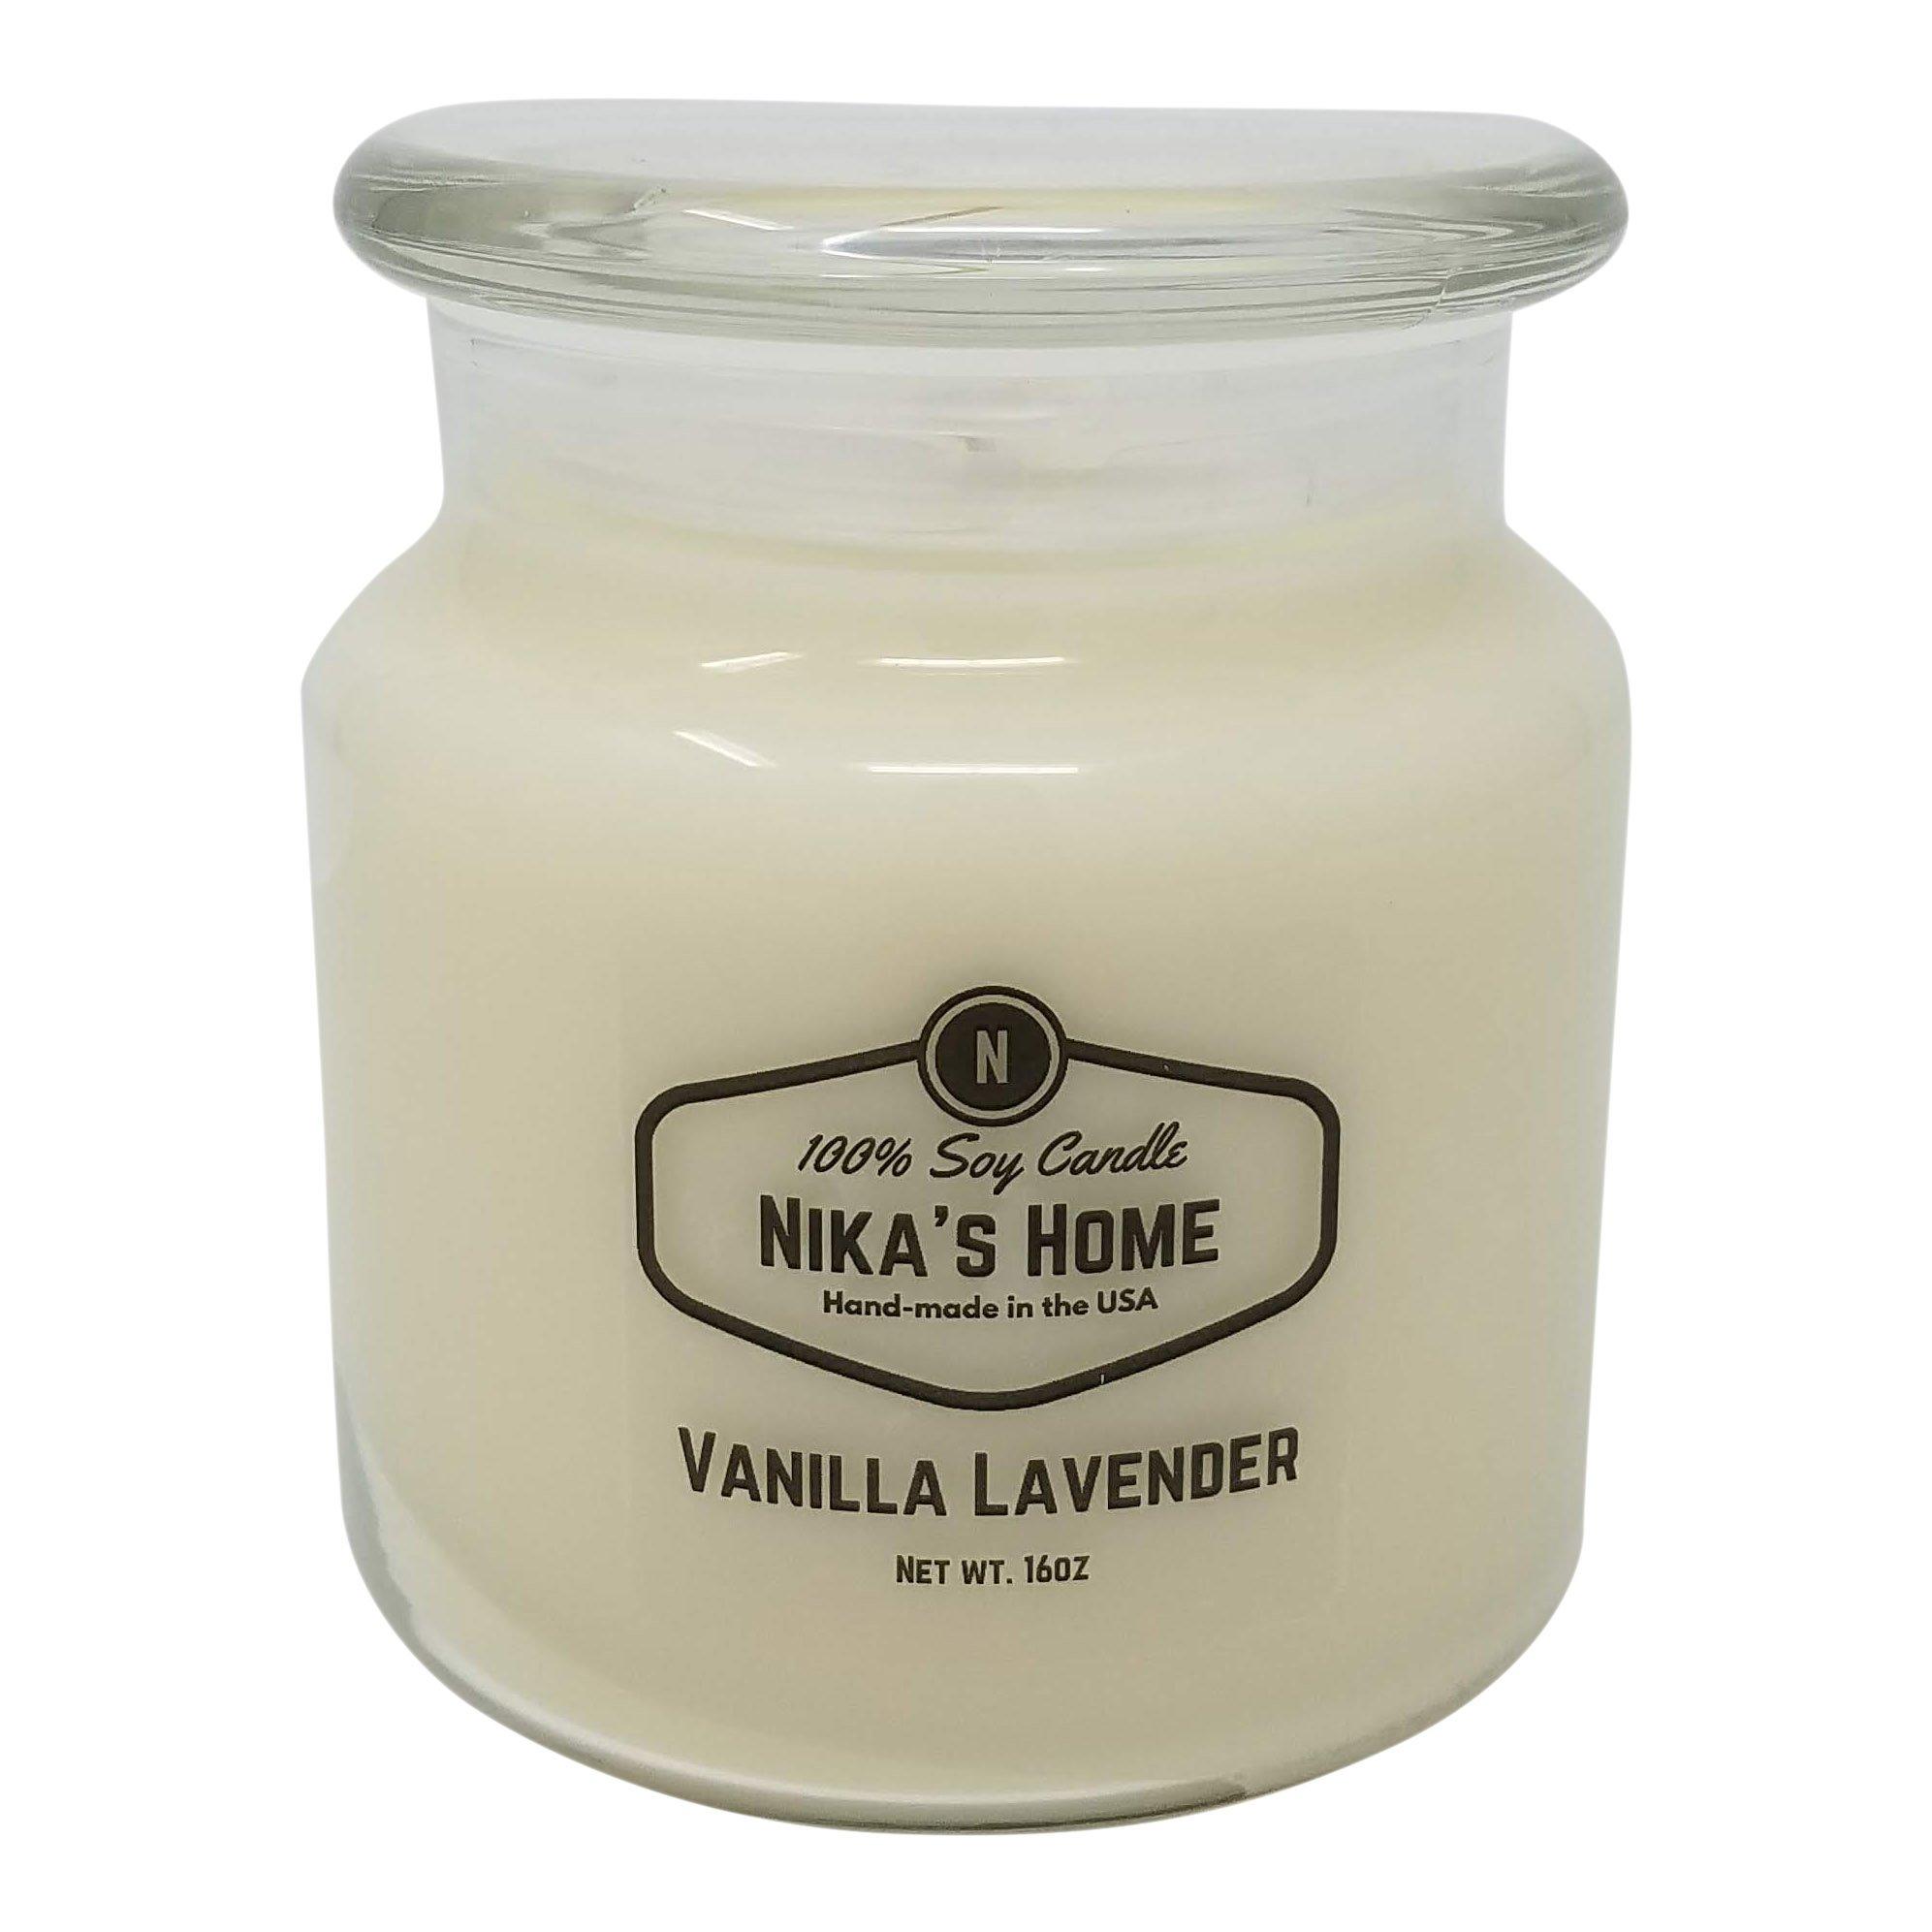 Nika's Home Vanilla Lavender 16oz Apothecary Soy Candle